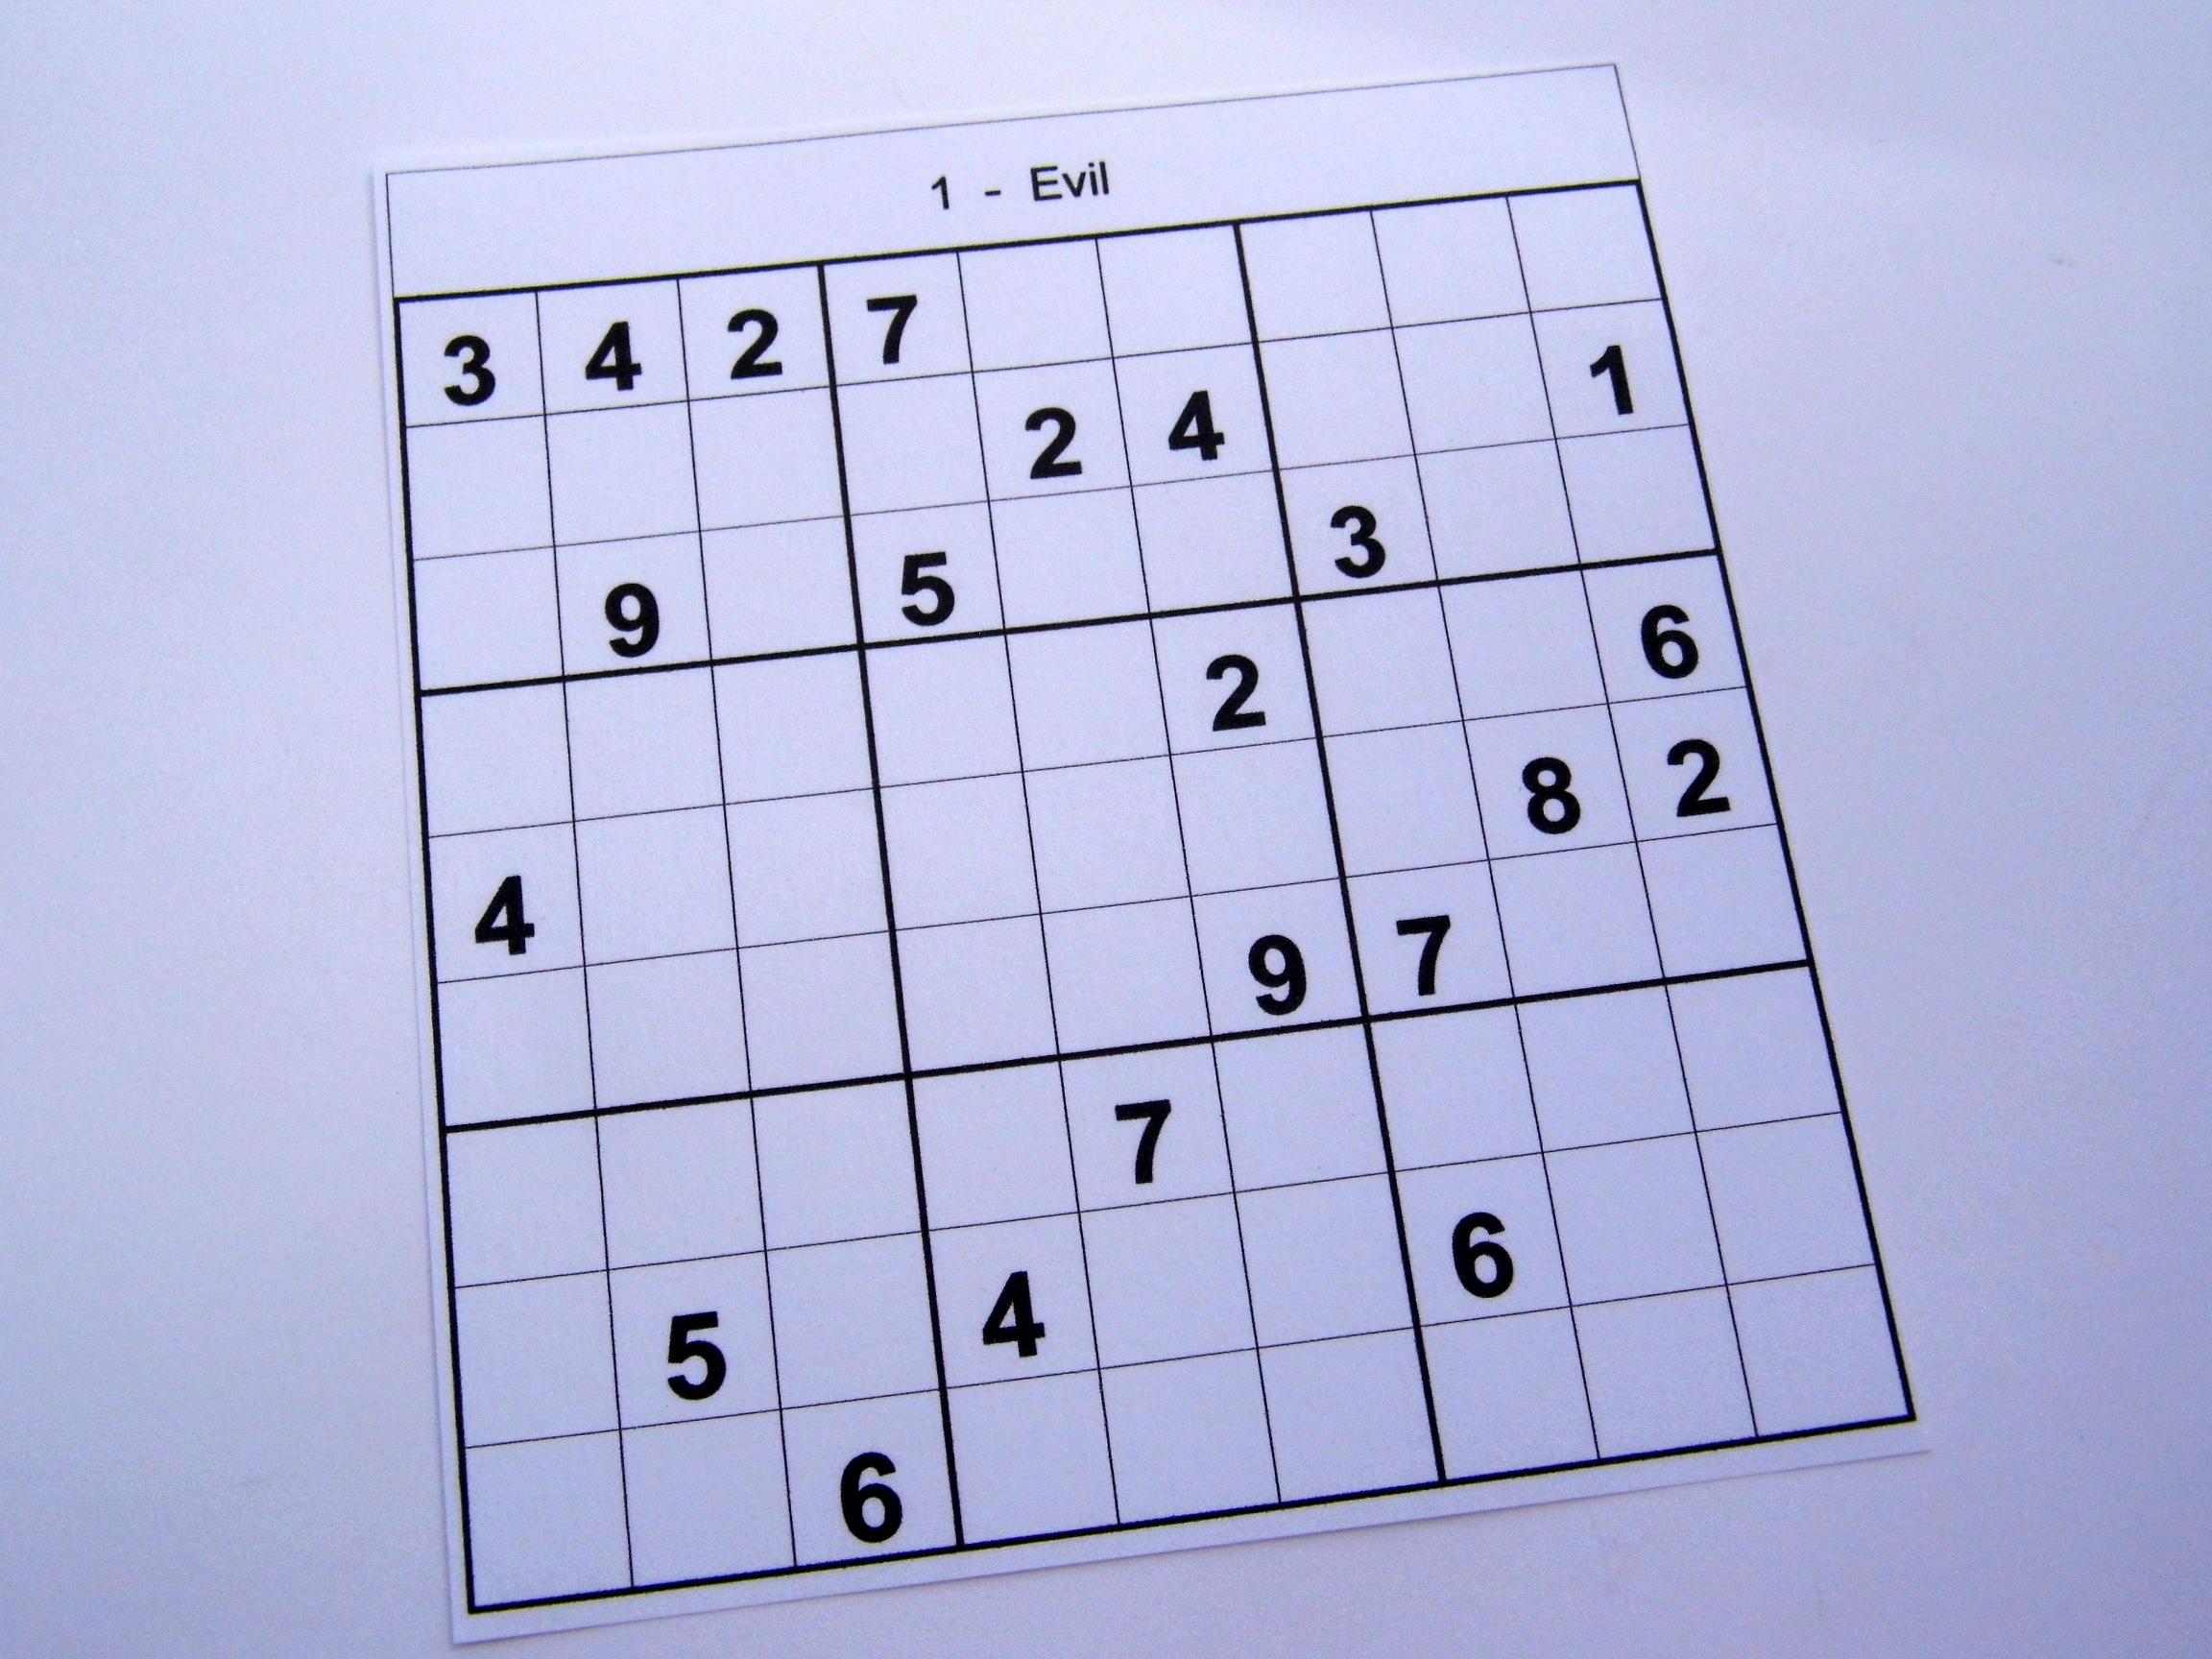 Hard Printable Sudoku Puzzles 2 Per Page – Book 1 – Free Sudoku Puzzles - Printable Sudoku Puzzles Hard